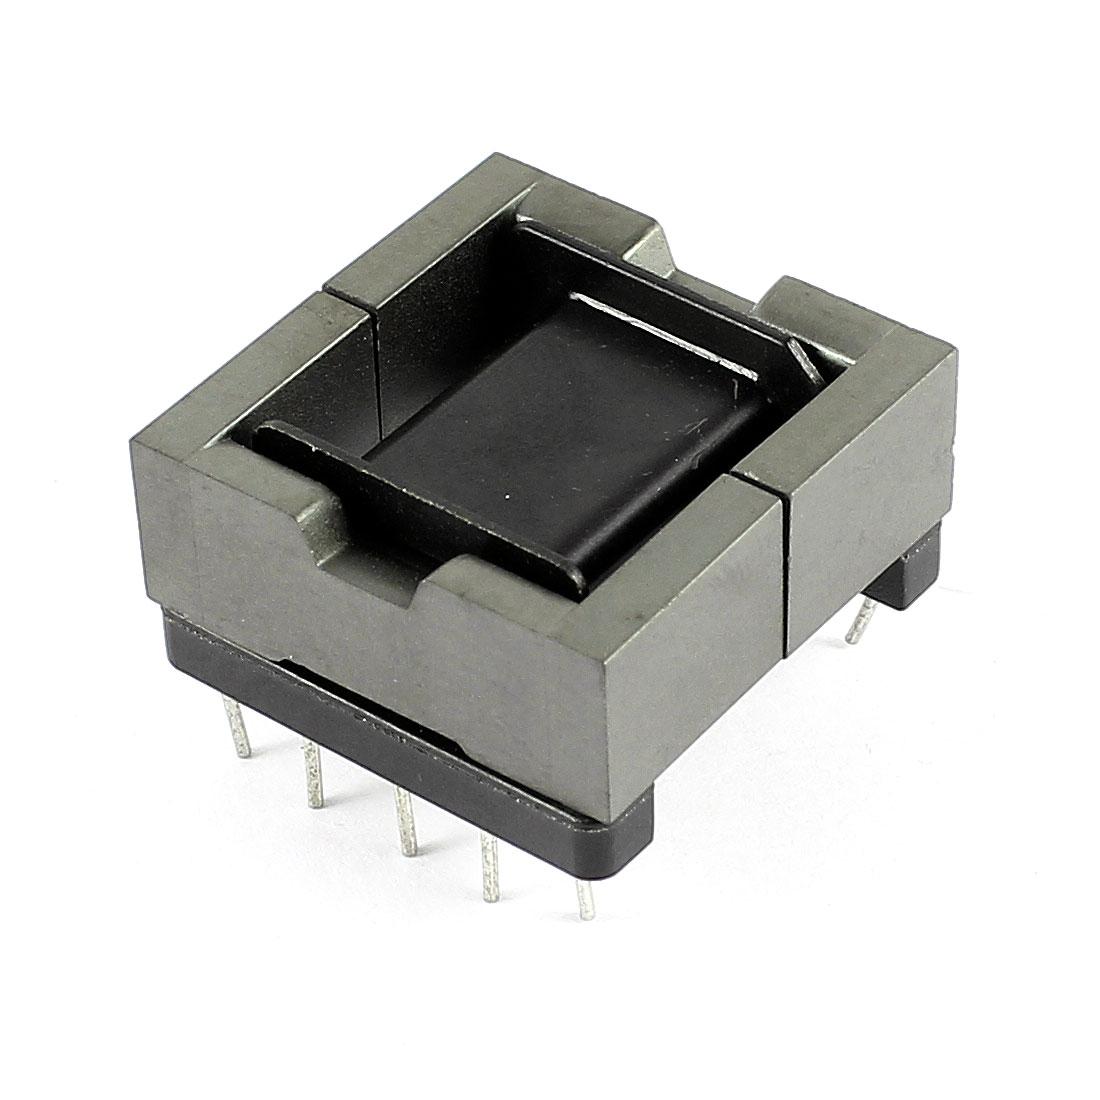 Plastic Iron Inductor 10 Pin Transformers Coil Former Robbin EPD25 Ferrite Core Bobbin Black